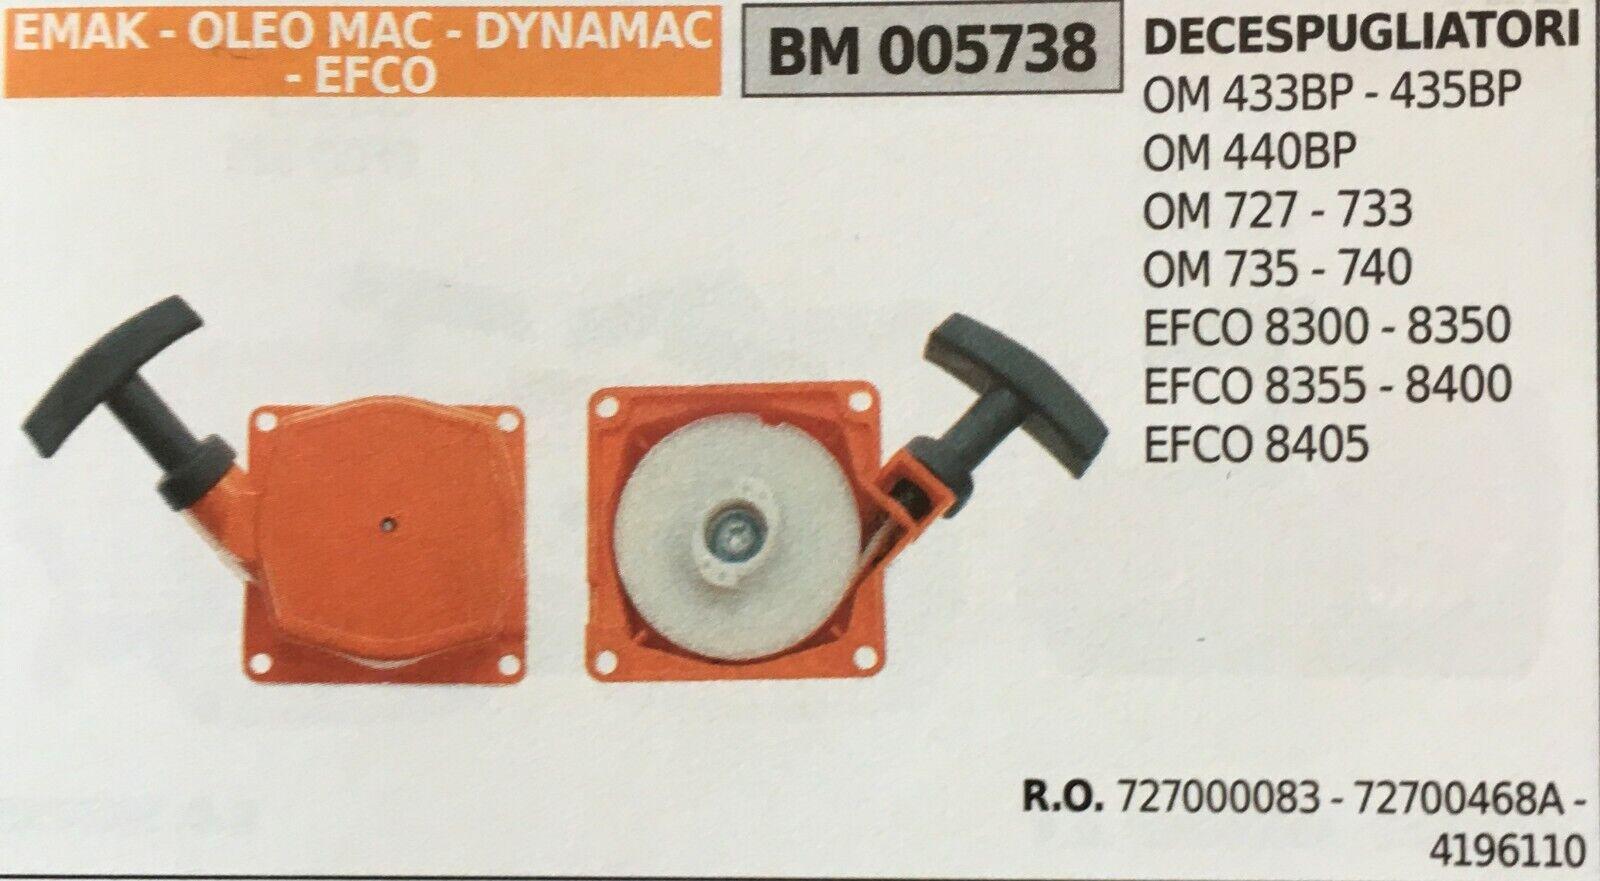 START KOMPLETT BRUMAR EMAK - OLEO MAC - DYNAMAC - EFCO BM005738